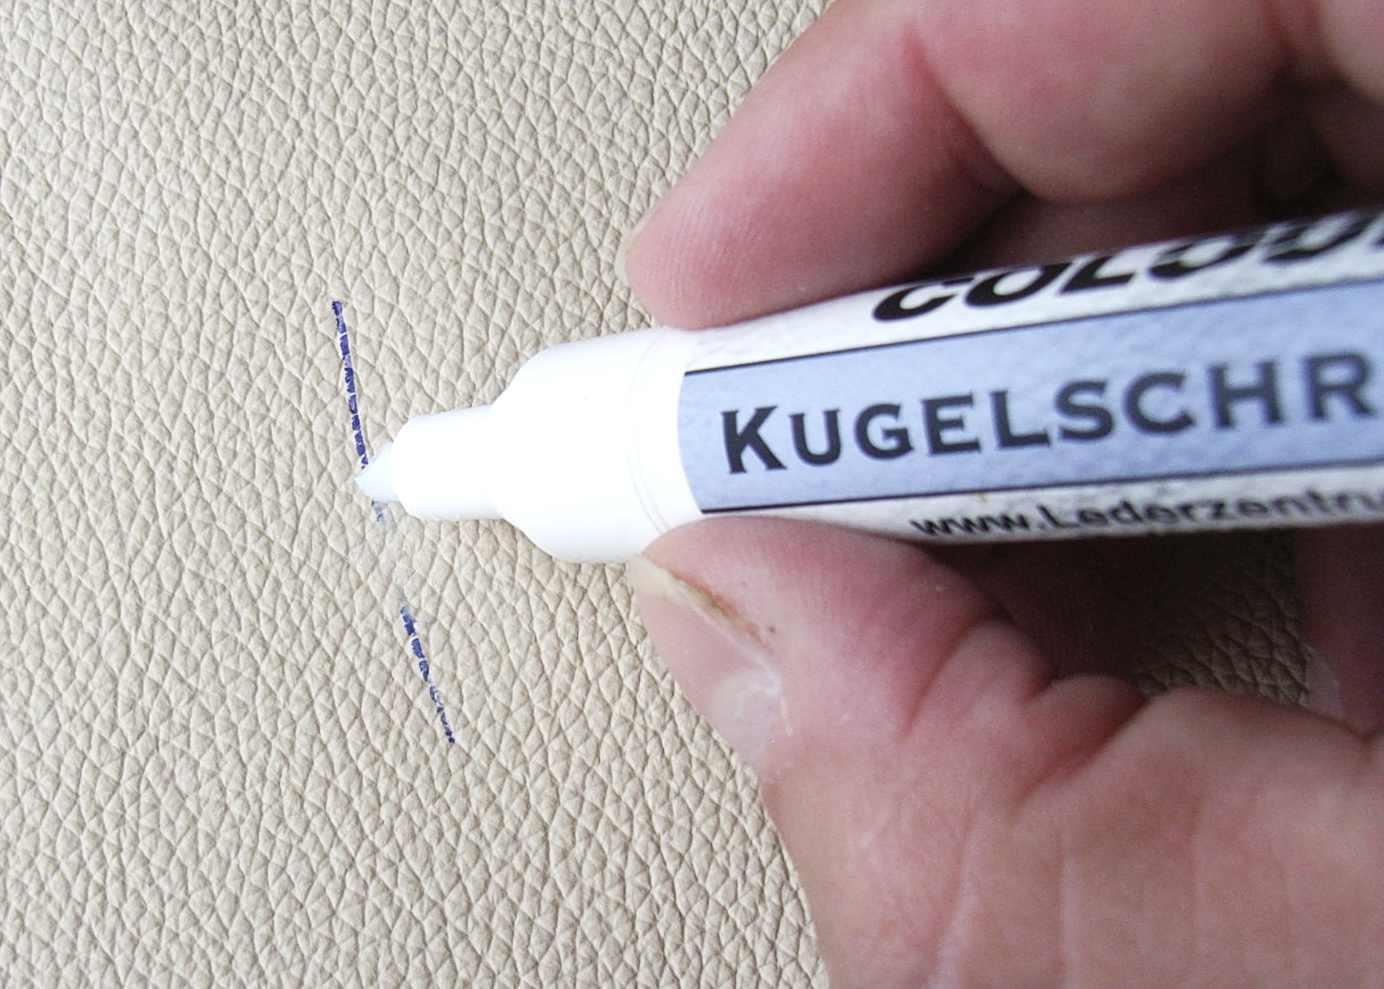 Как и чем можно стереть карандаш без ластика с обоев